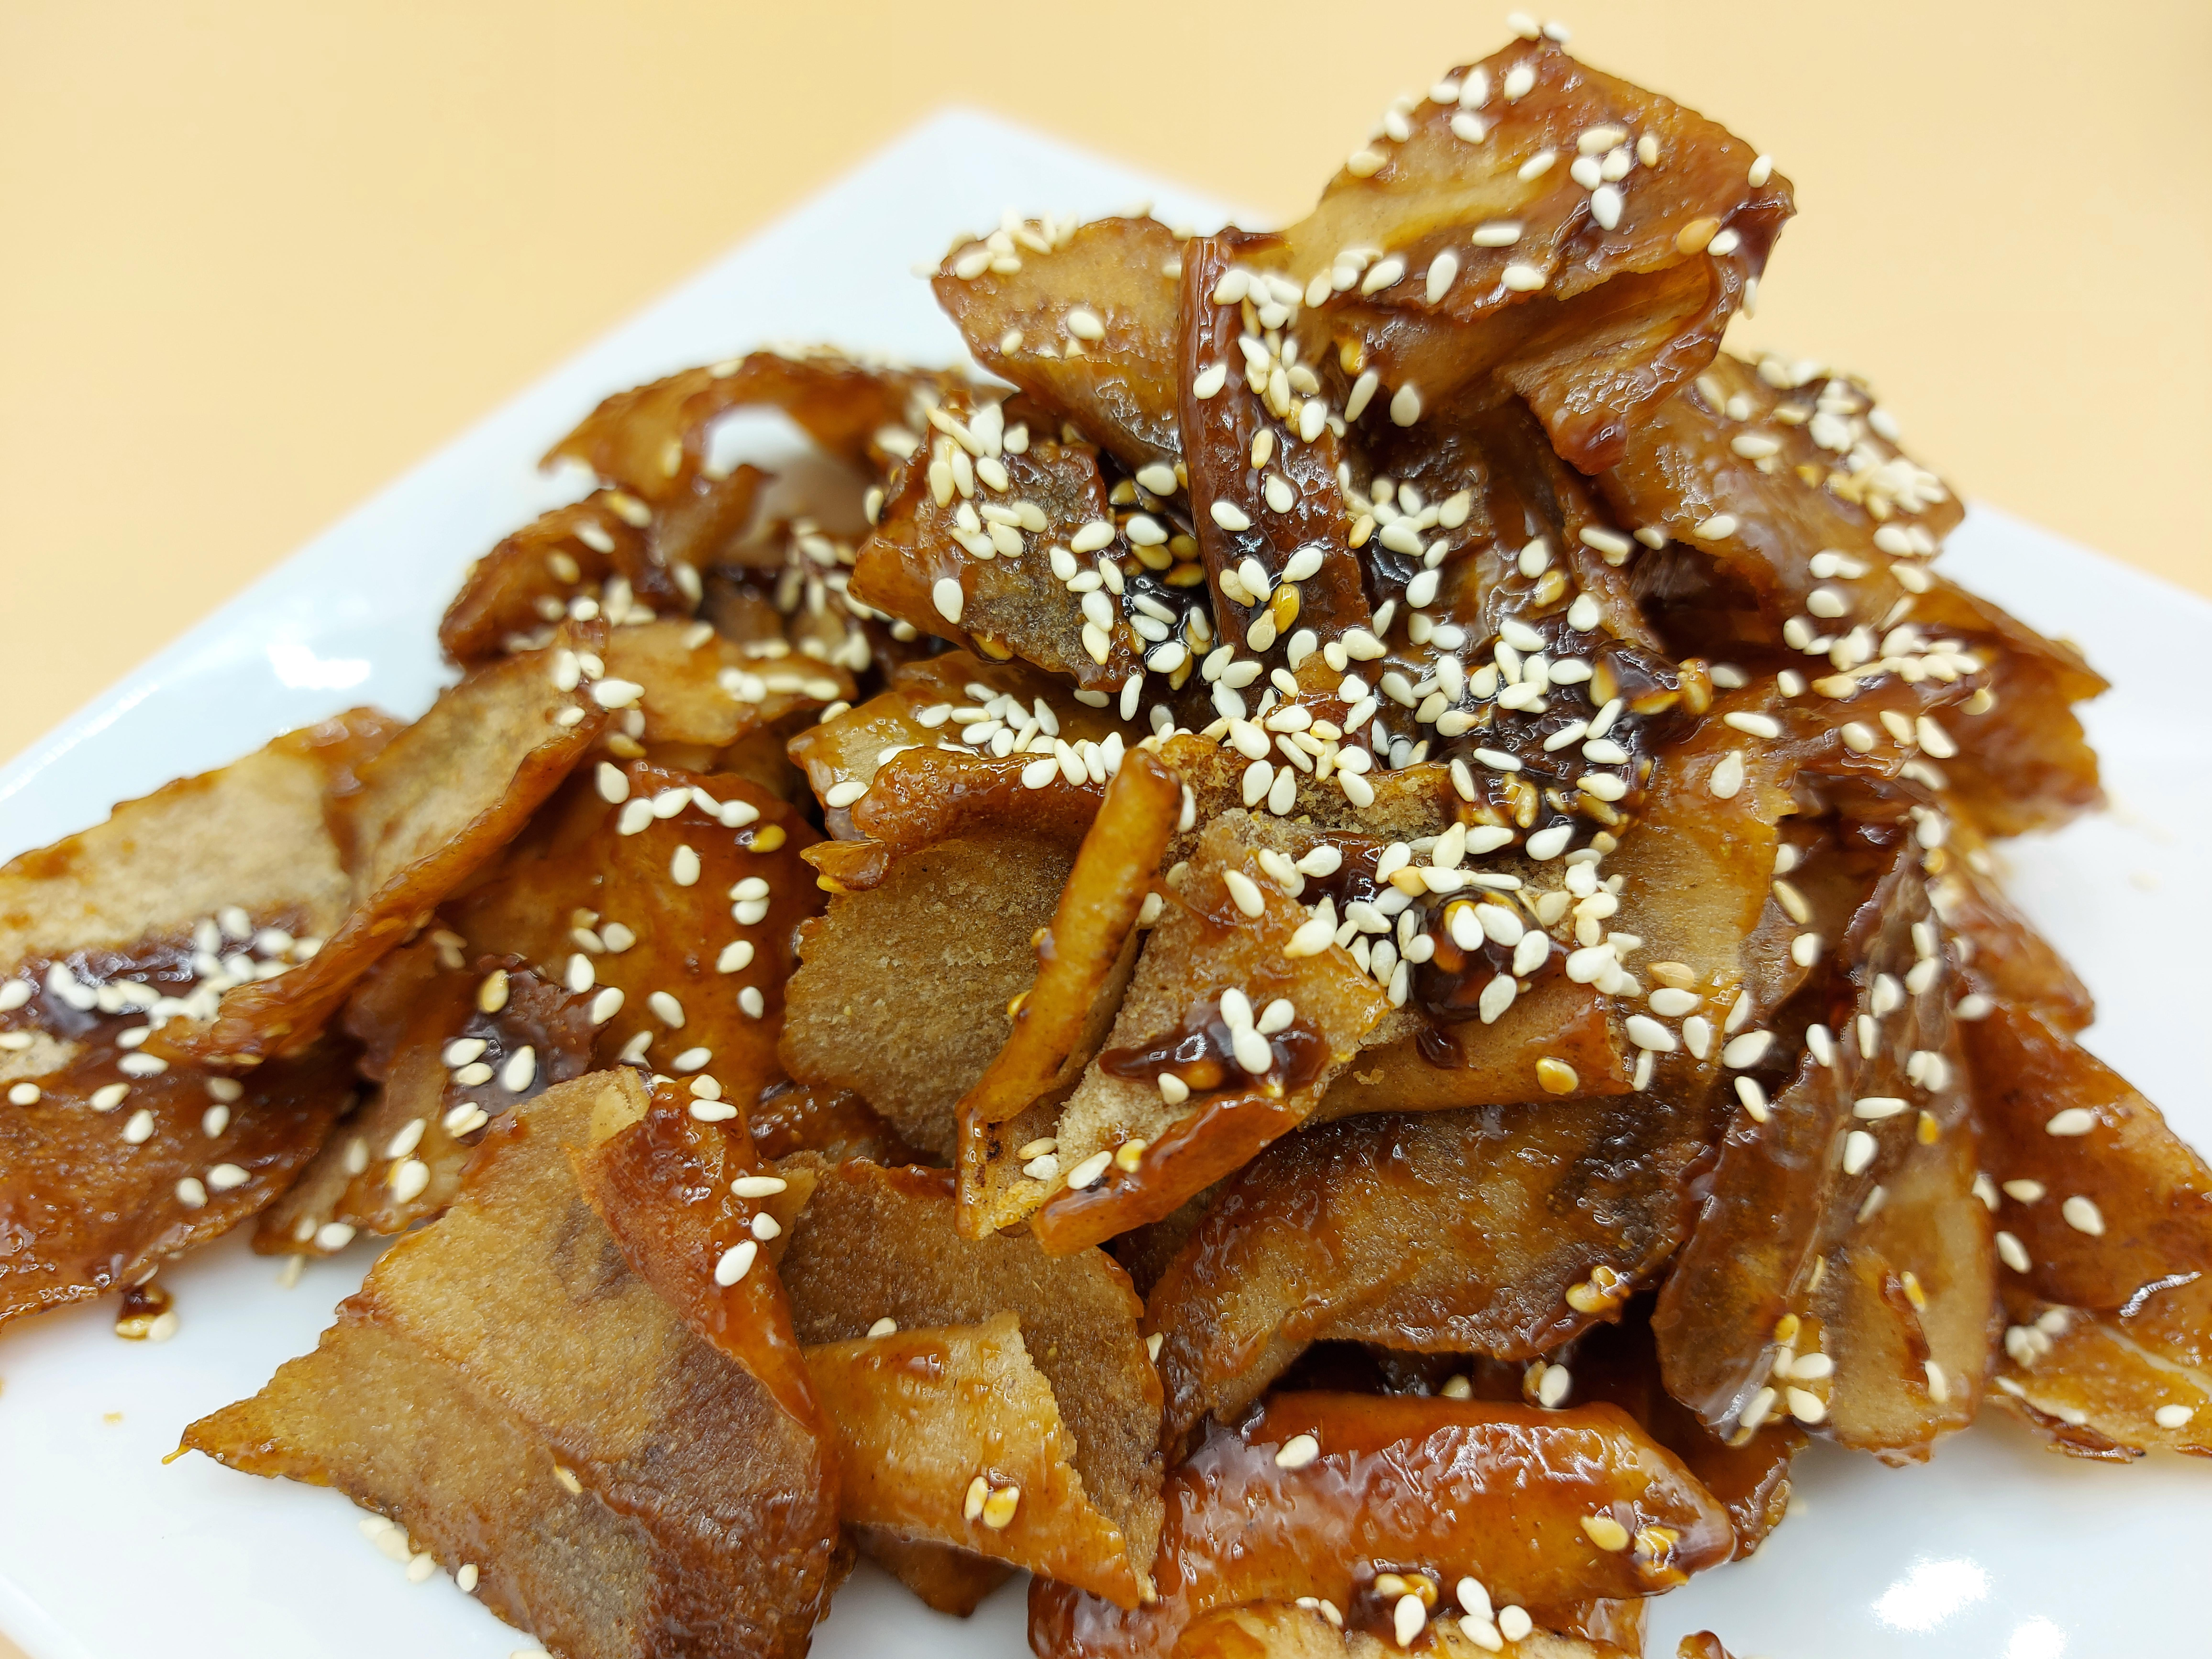 Thumbnail for Pain frit à la mélasse de caroube – حارق إصبعه